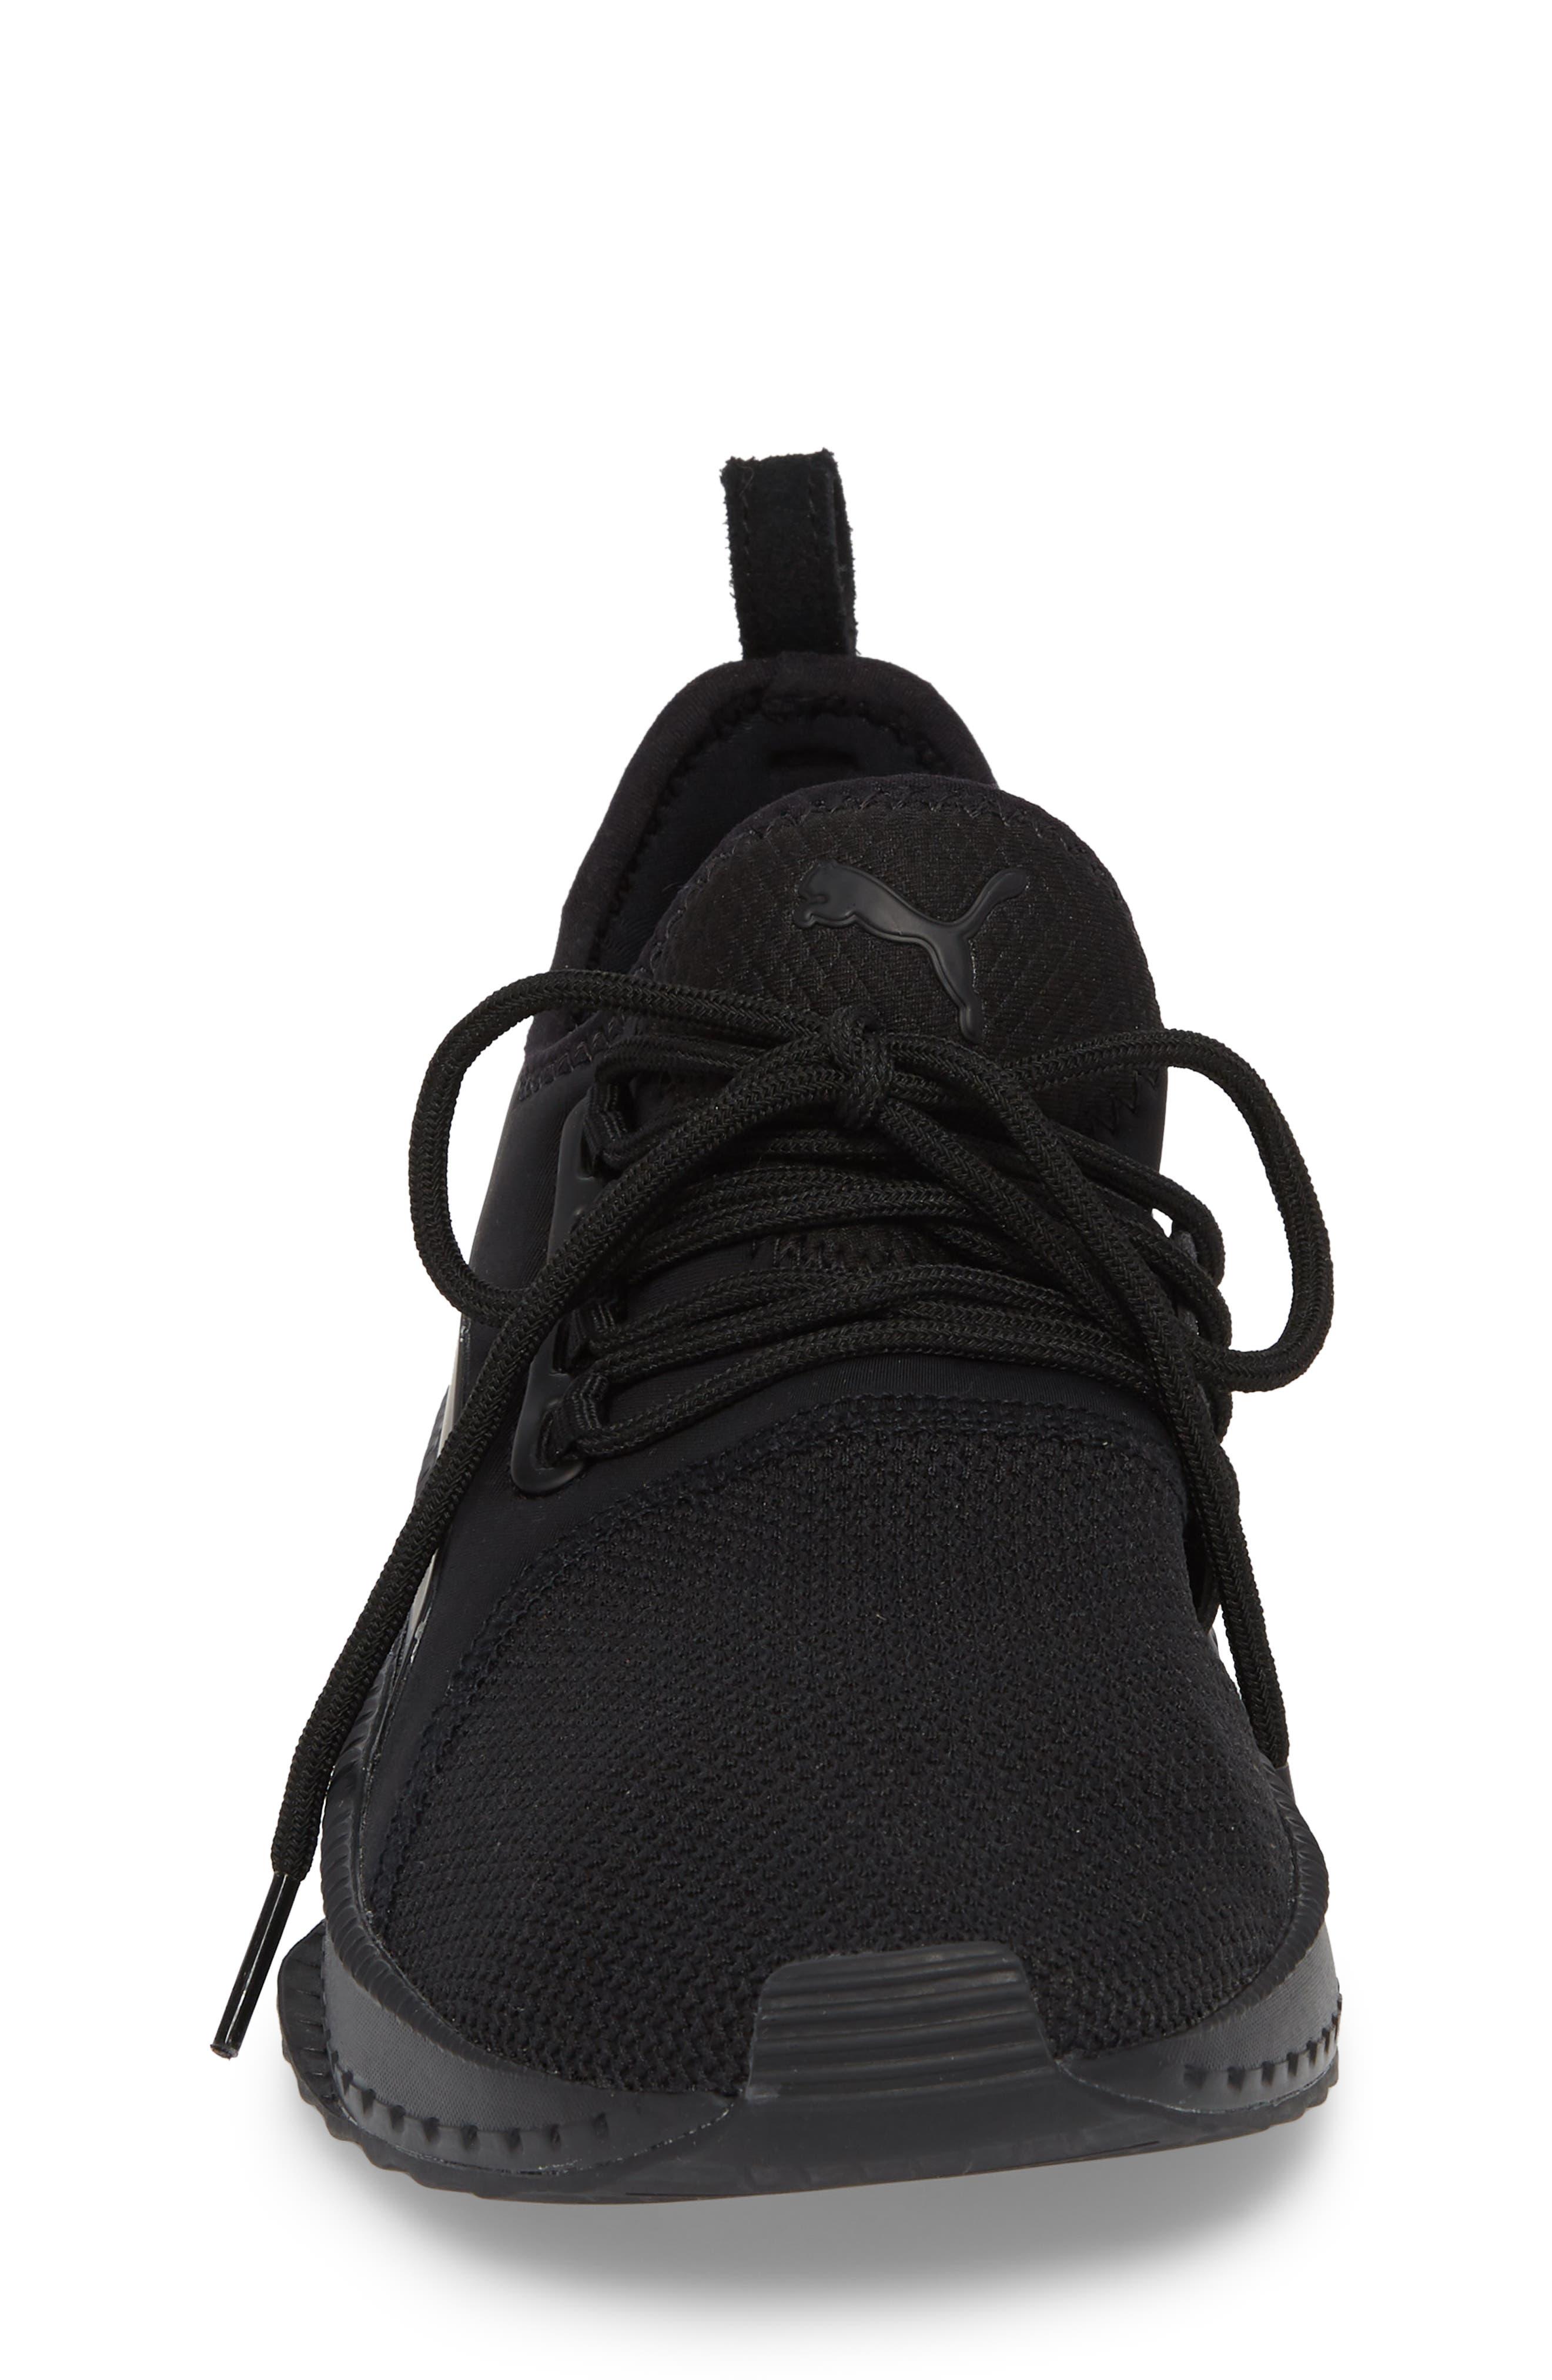 Tsugi Apex Sneaker,                             Alternate thumbnail 4, color,                             001